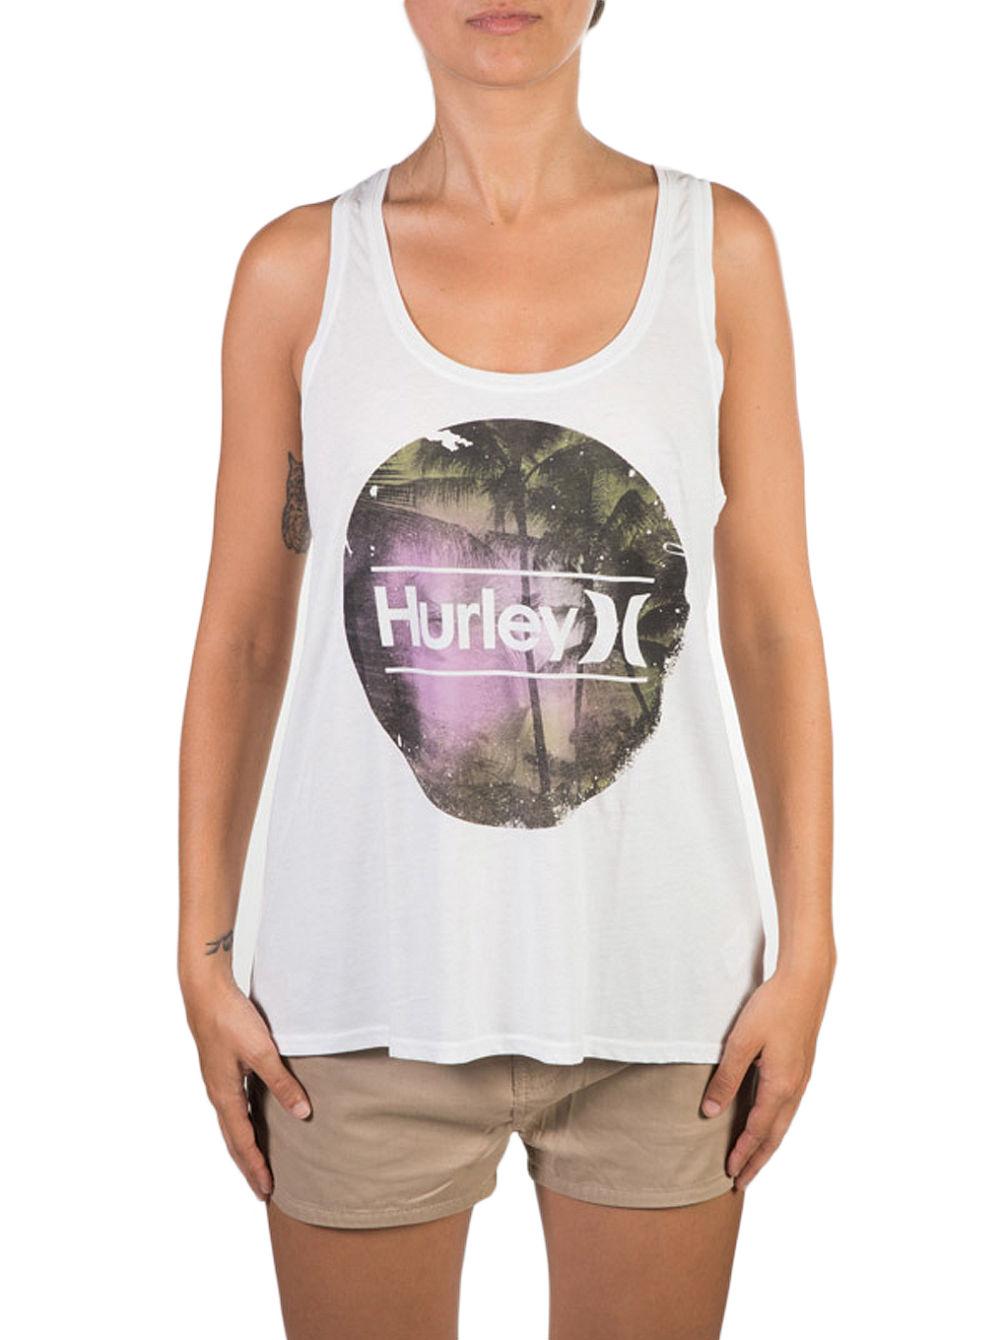 hurley-retreat-perfect-tank-top